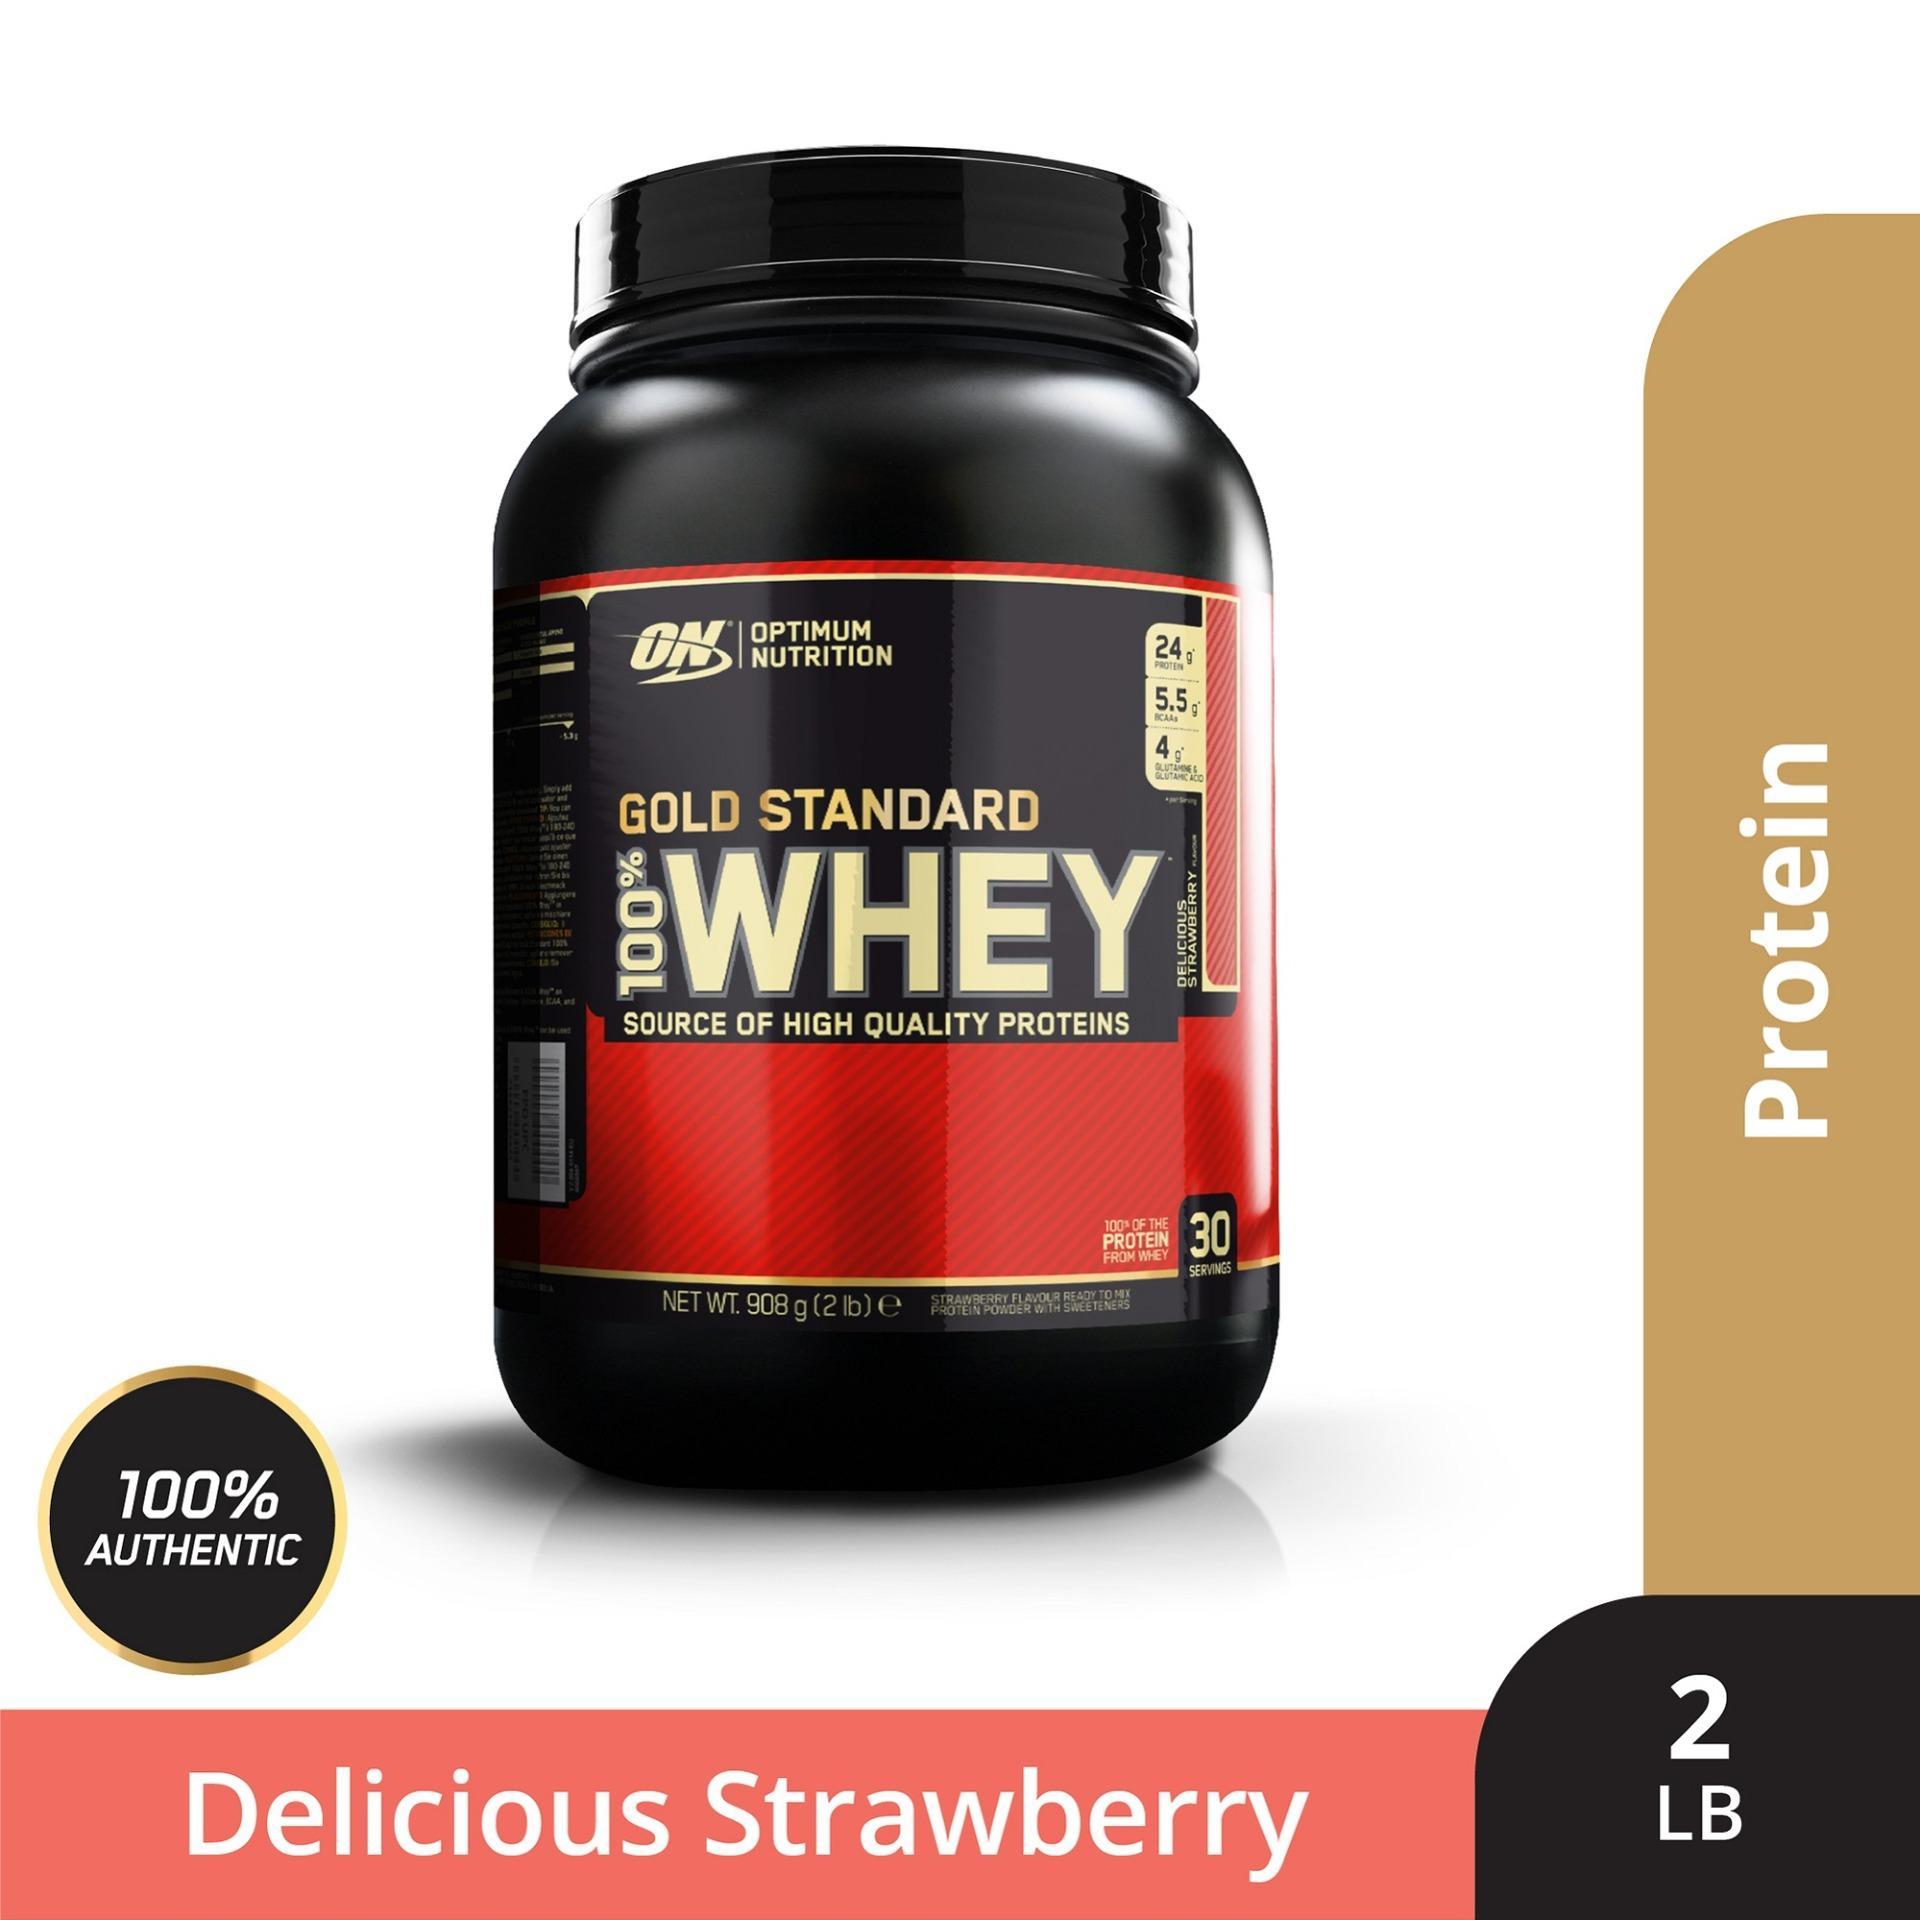 Thực phẩm bổ sung Optimum NutritionGold Standard 100% Whey Delicious Strawberry 2 lbs nhập khẩu